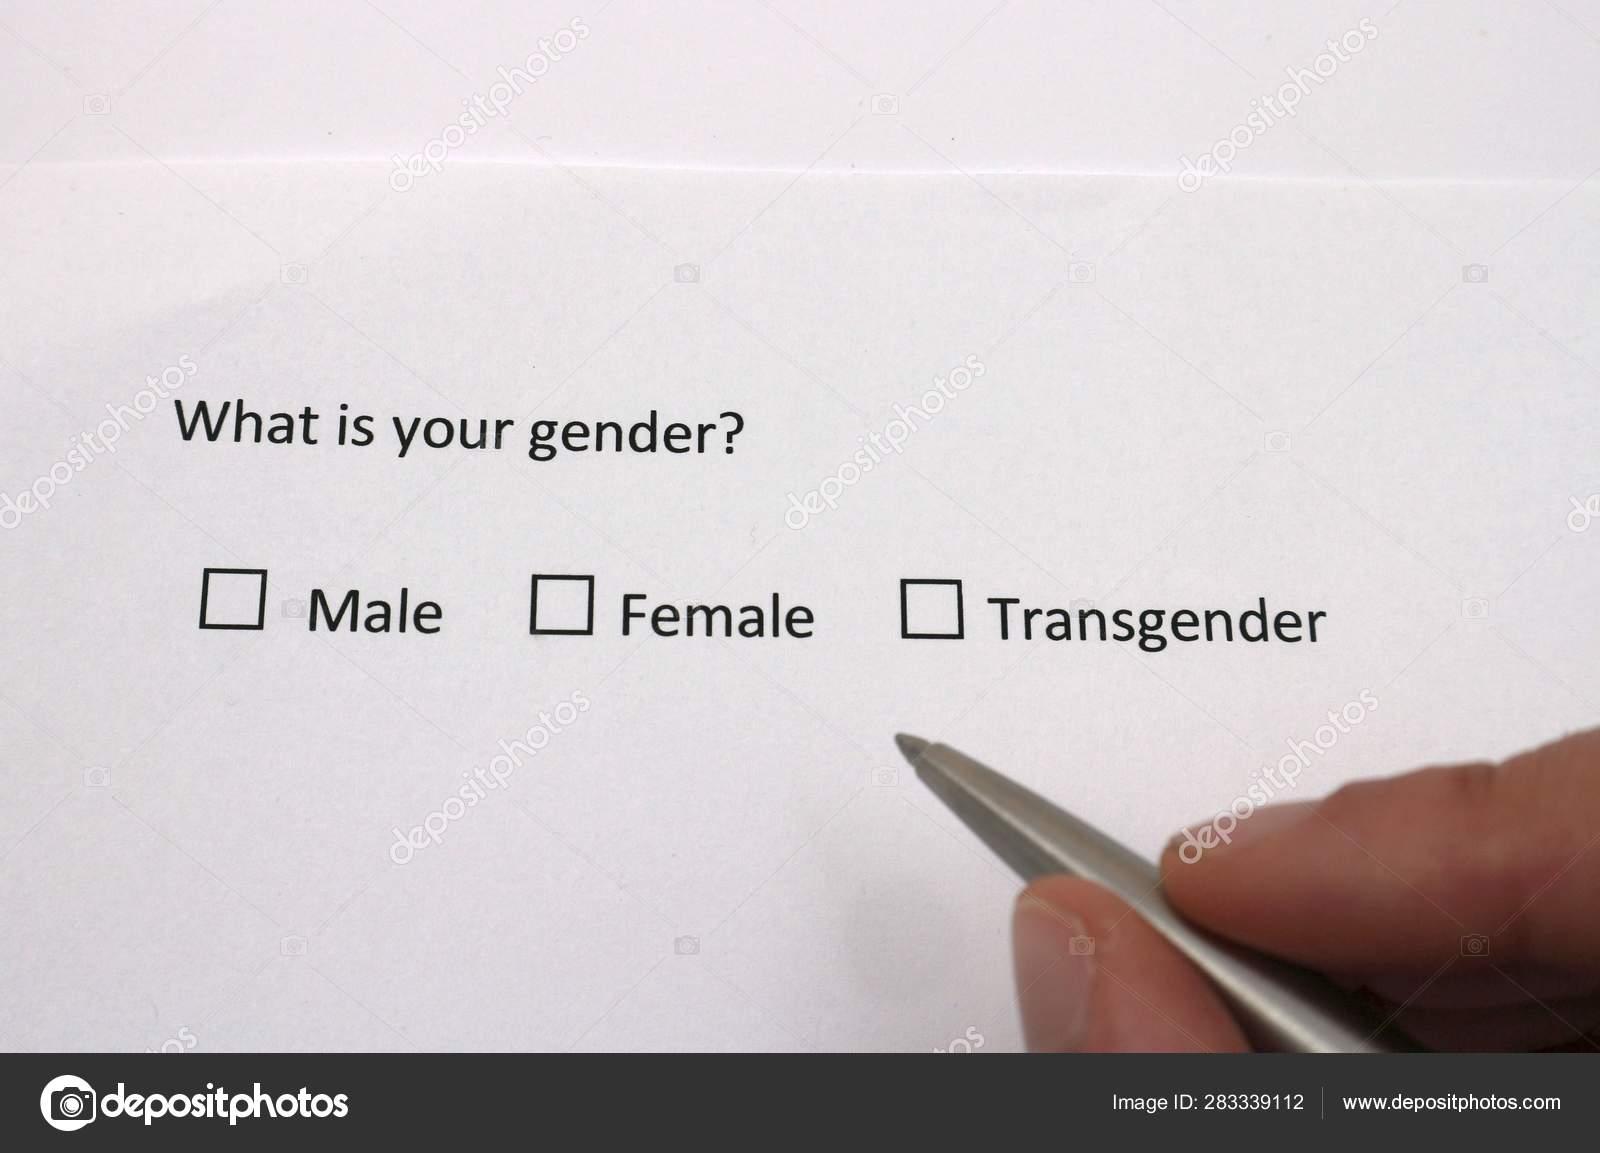 Male, female or transgender? Gender identity in survey